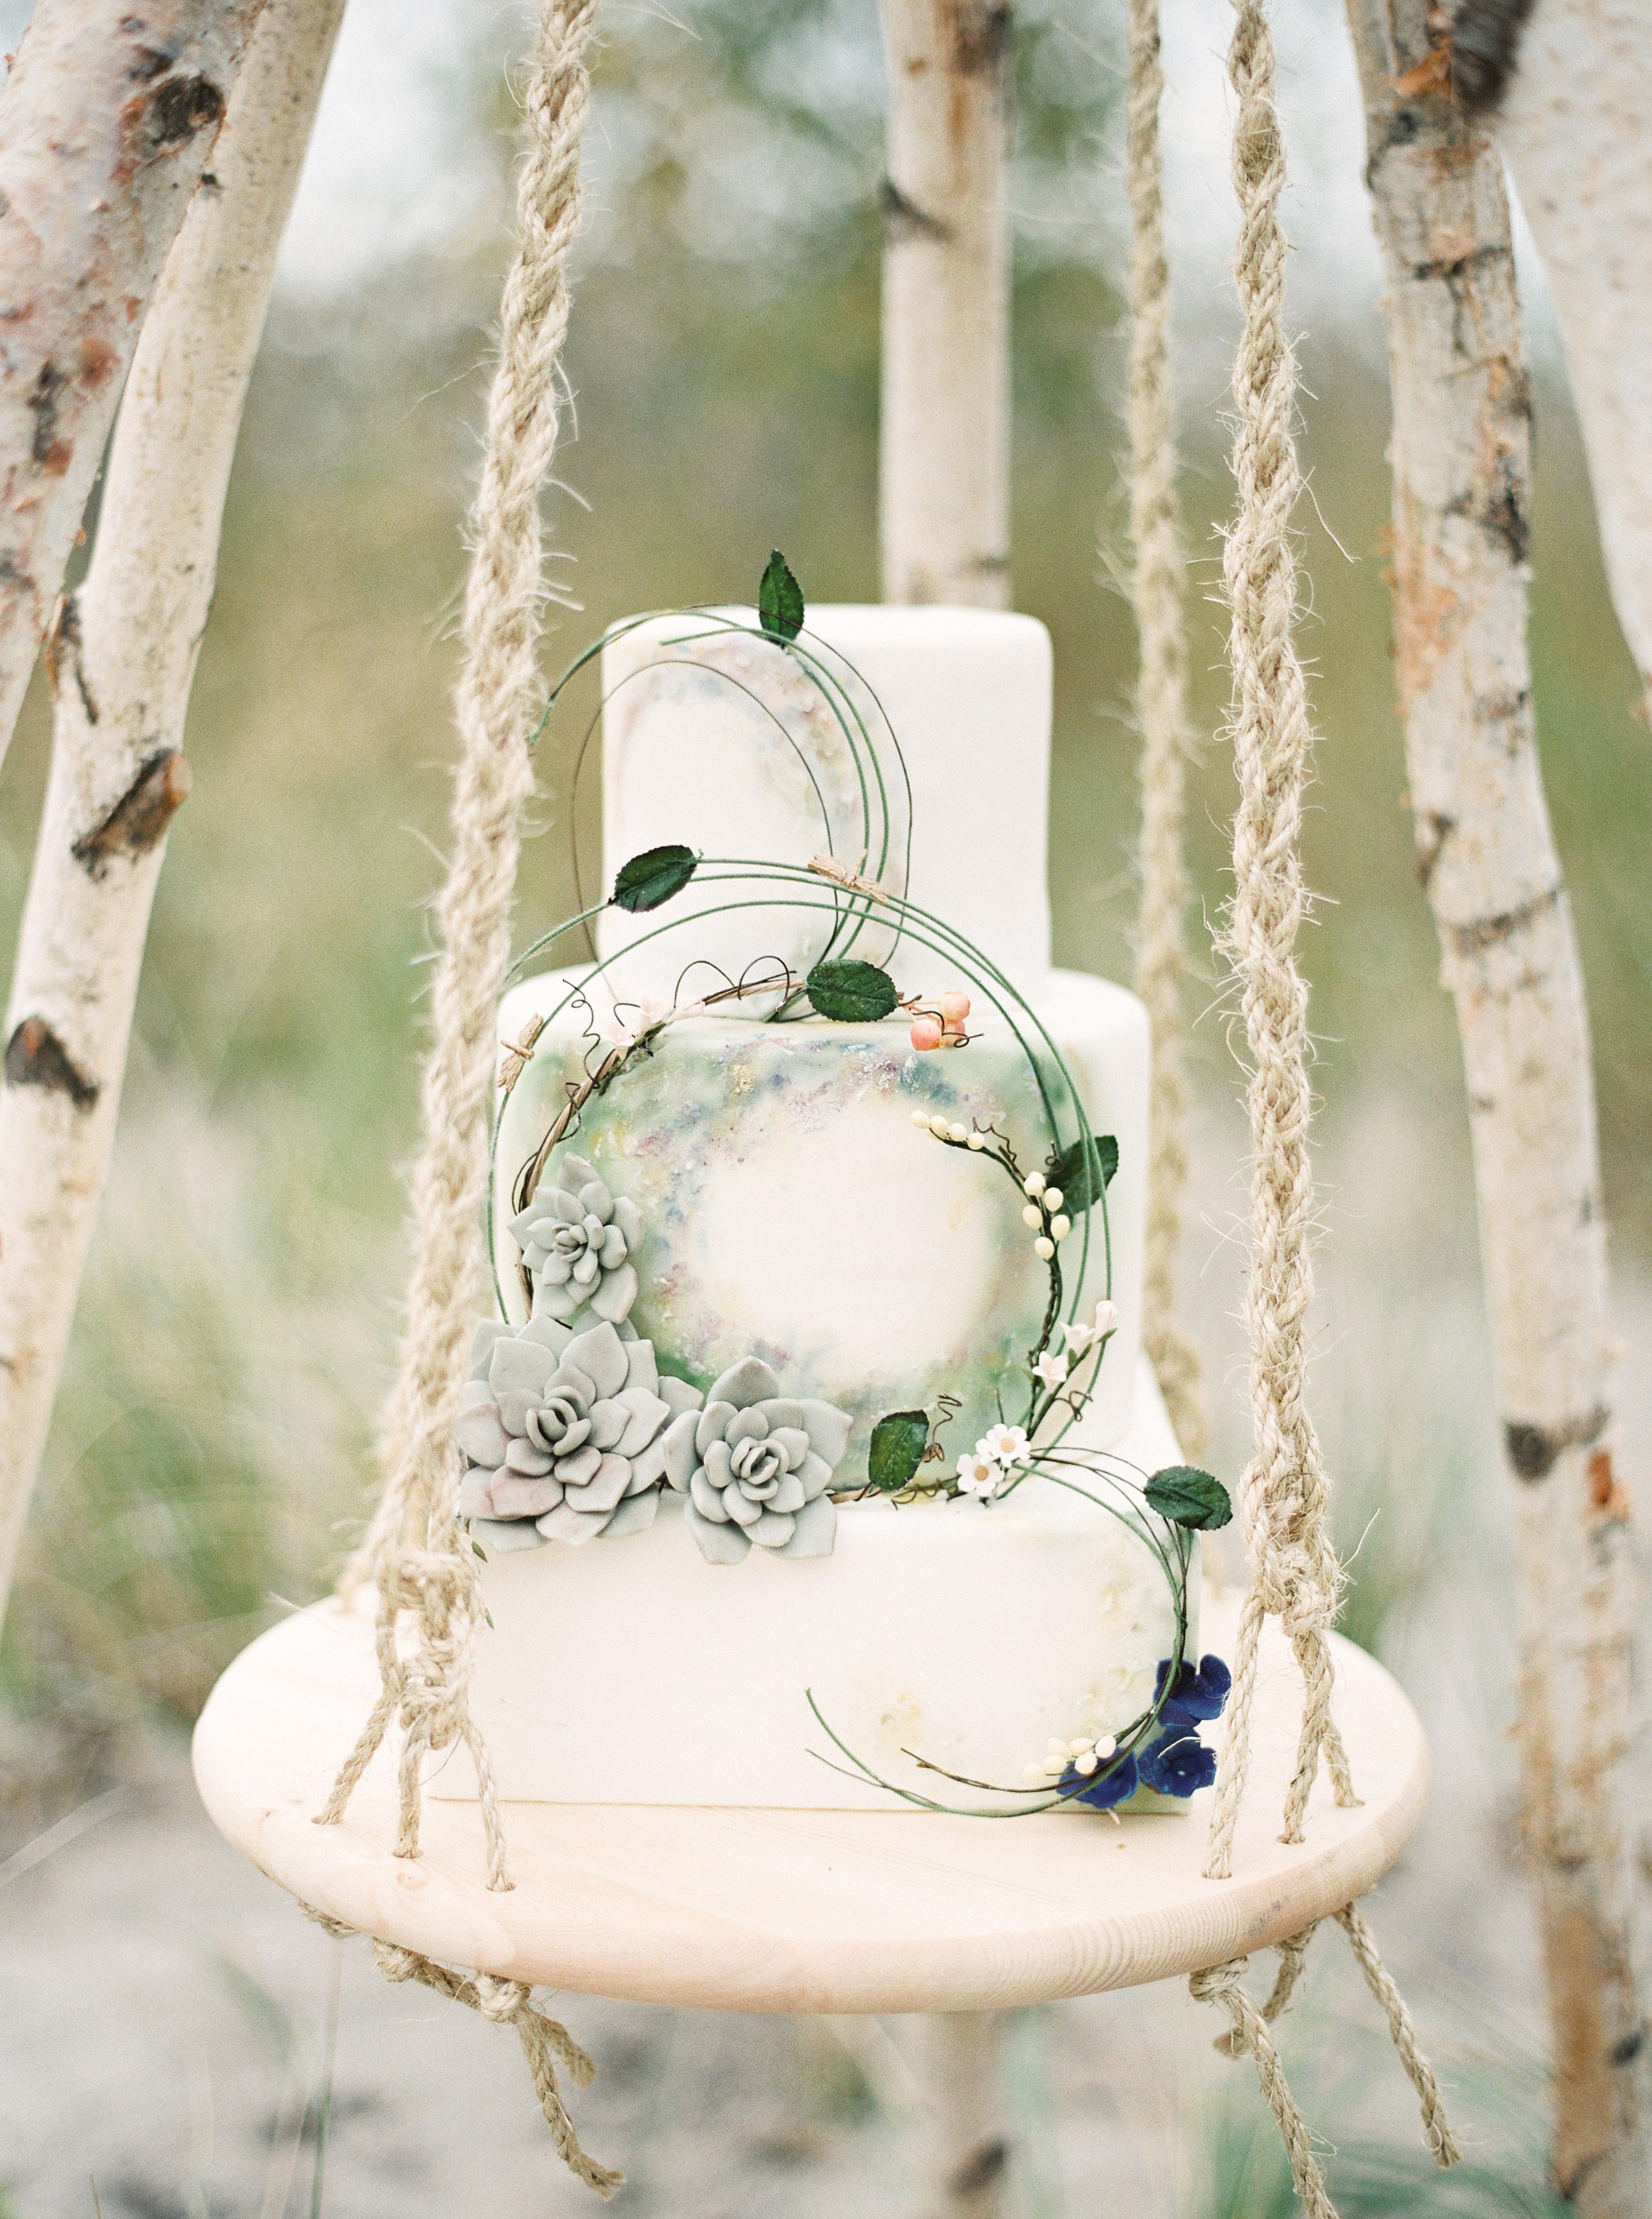 wedding cake hoop